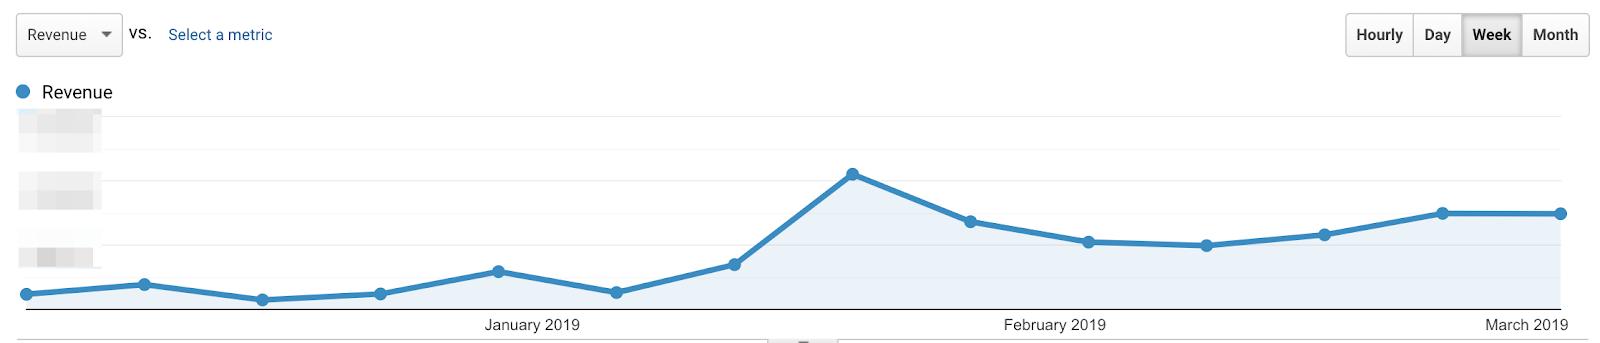 graph depicting revenues